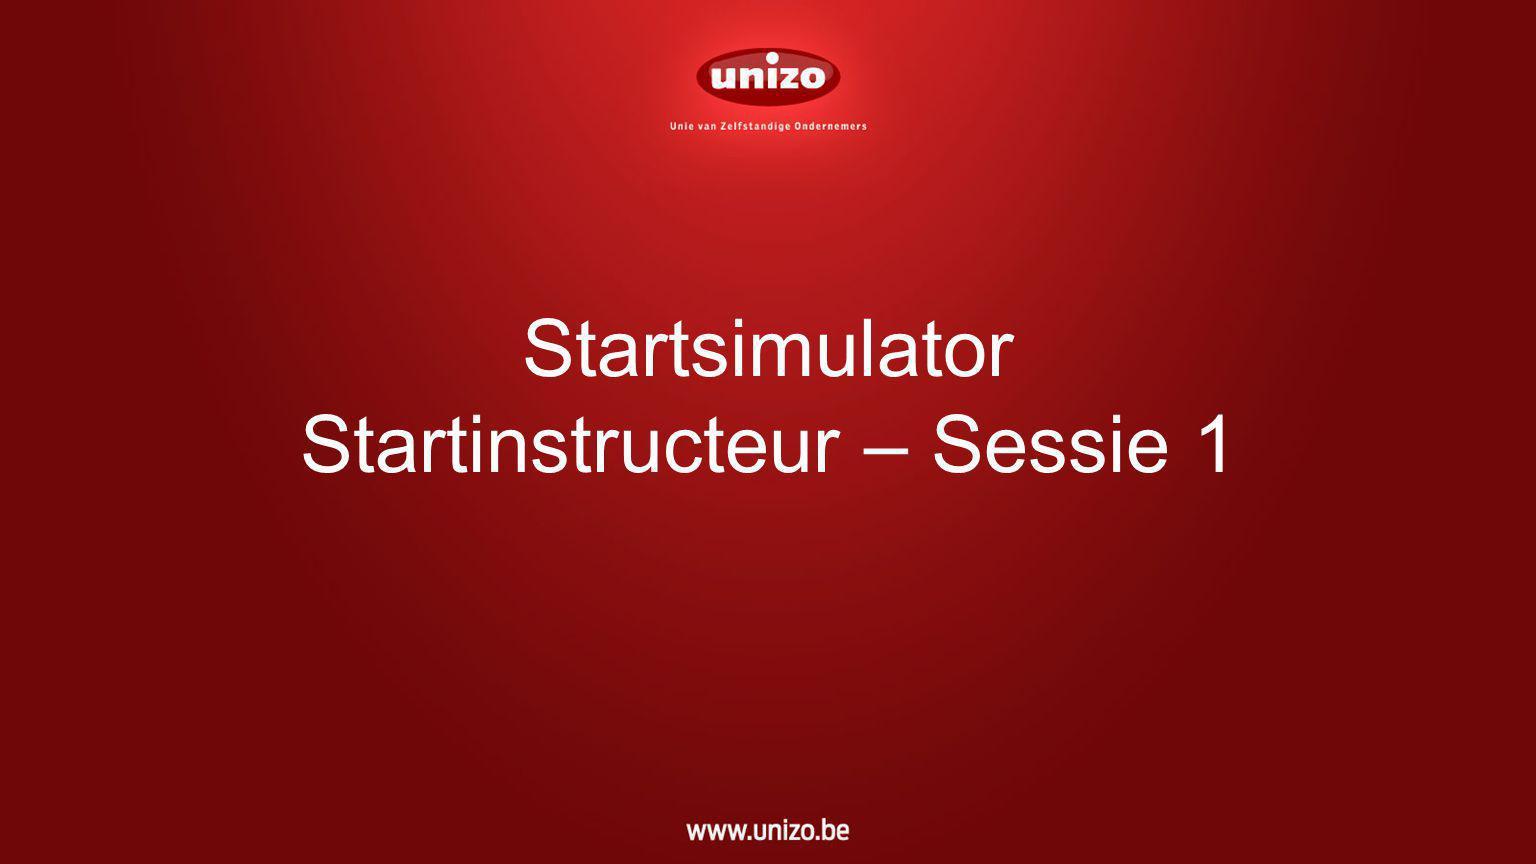 Startsimulator Startinstructeur – Sessie 1